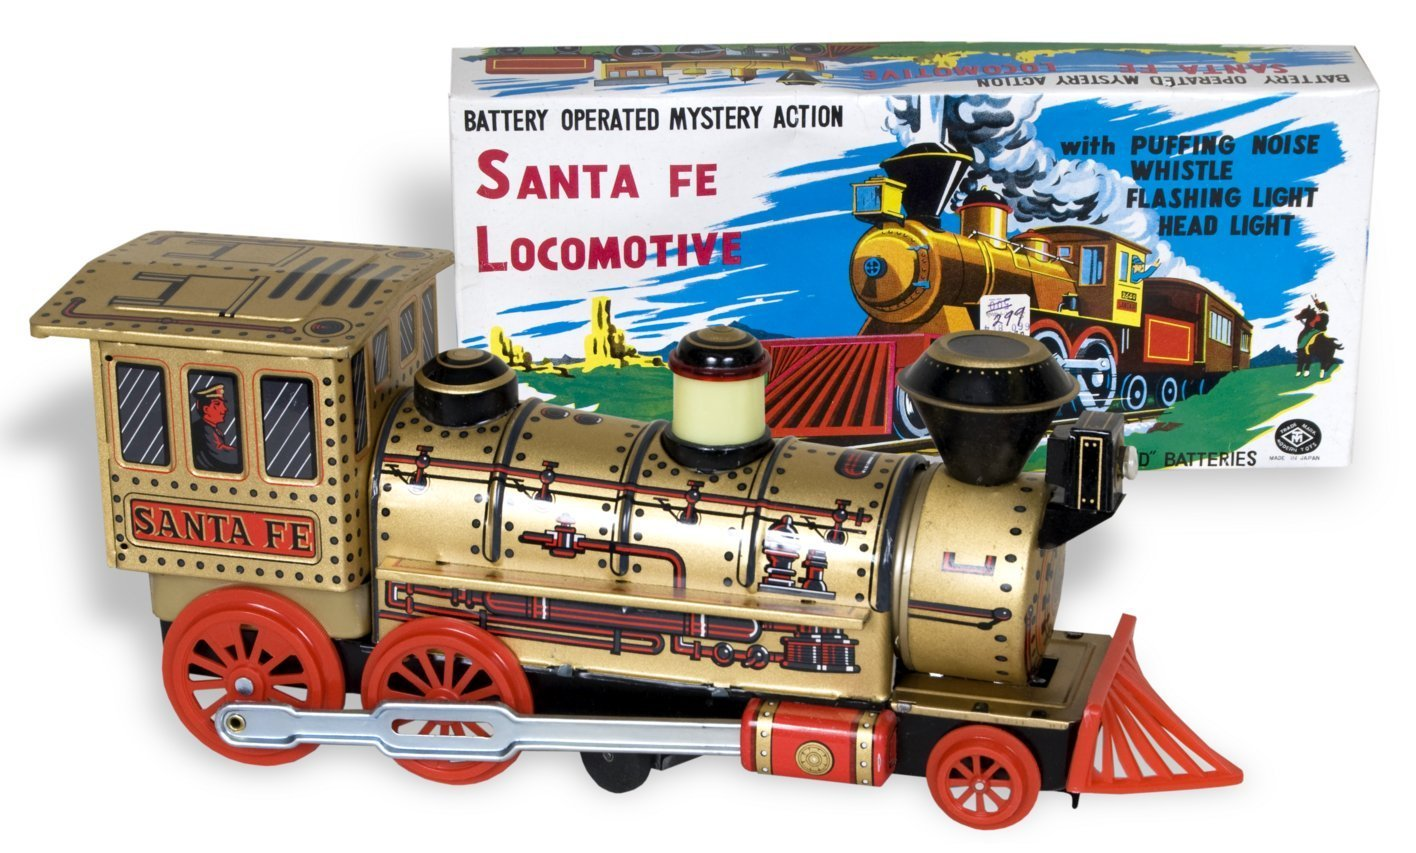 Toy train - Kansas Memory - Kansas Historical Society